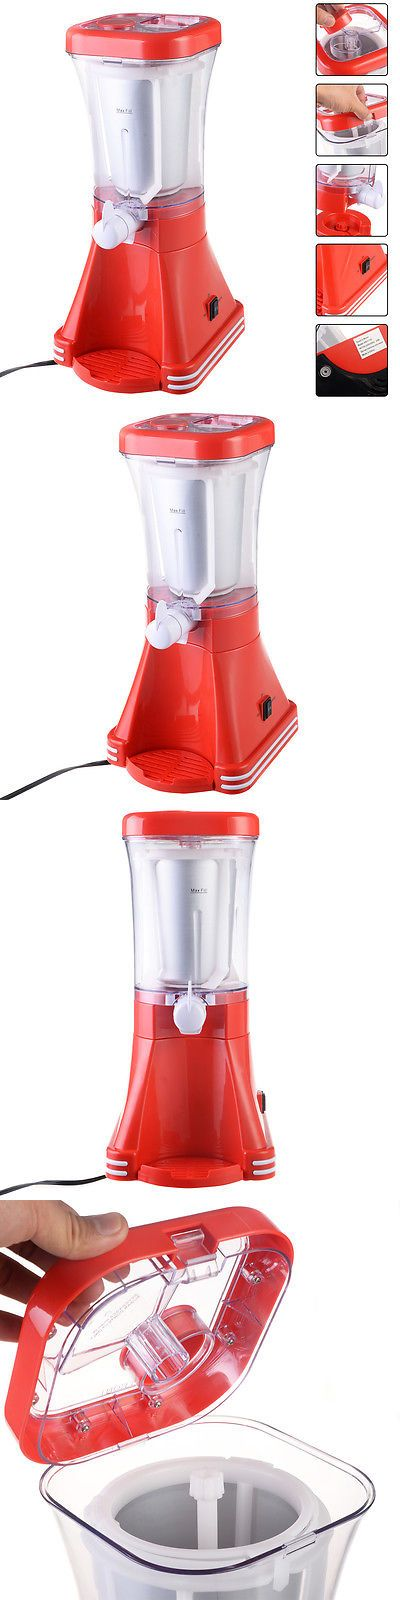 appliances: New Slush Drink Maker Retro Machine Blender Ice Slushie Margarita Slurpee Frozen -> BUY IT NOW ONLY: $35.99 on eBay!